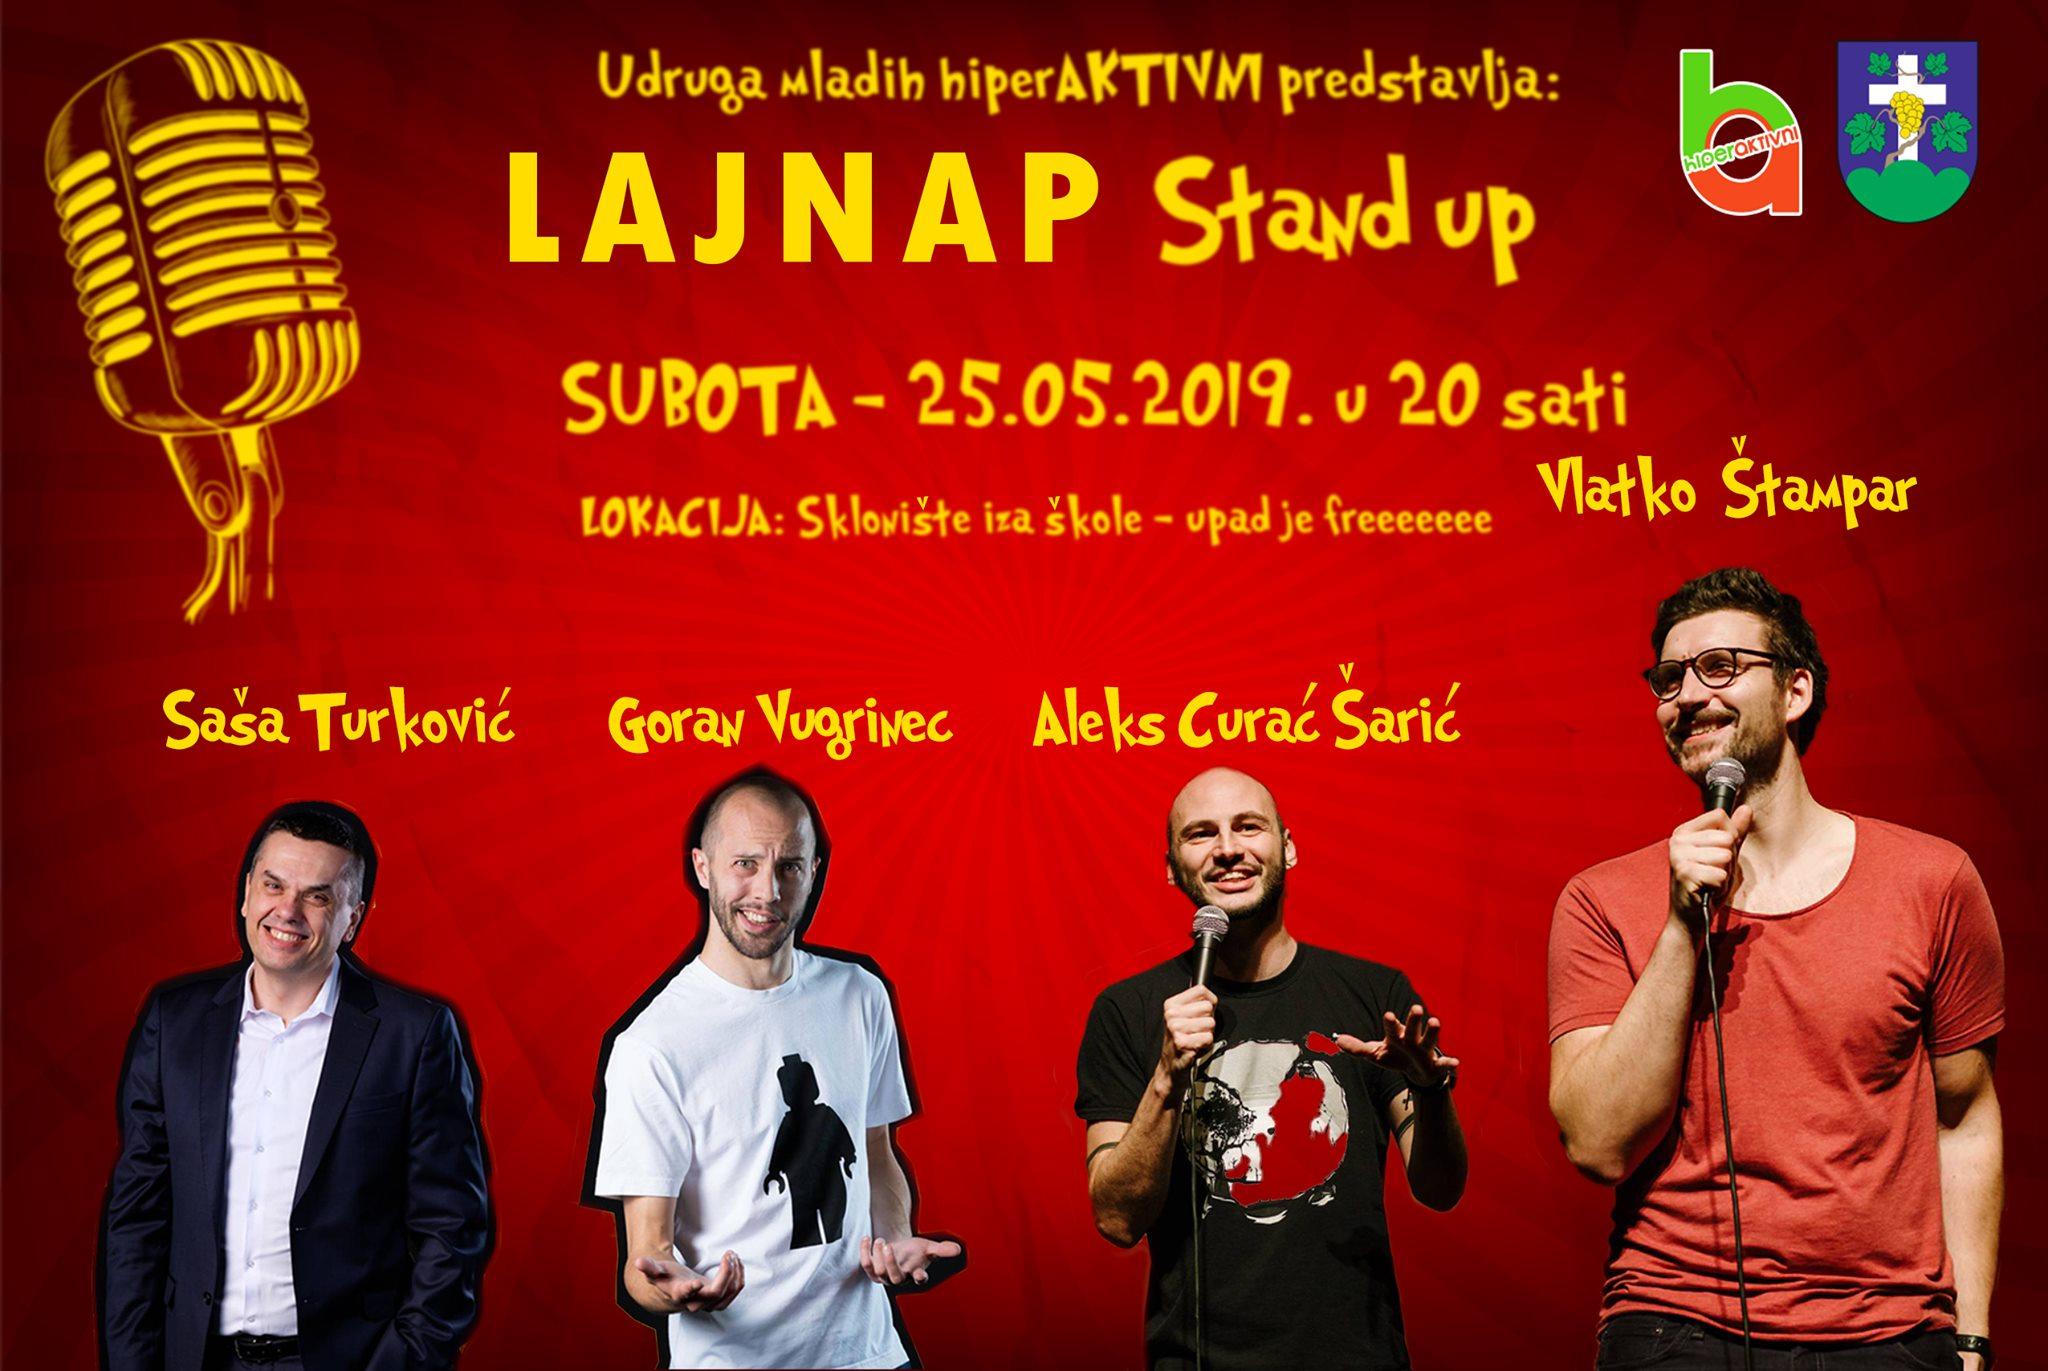 Stand up Lajnap Cestica